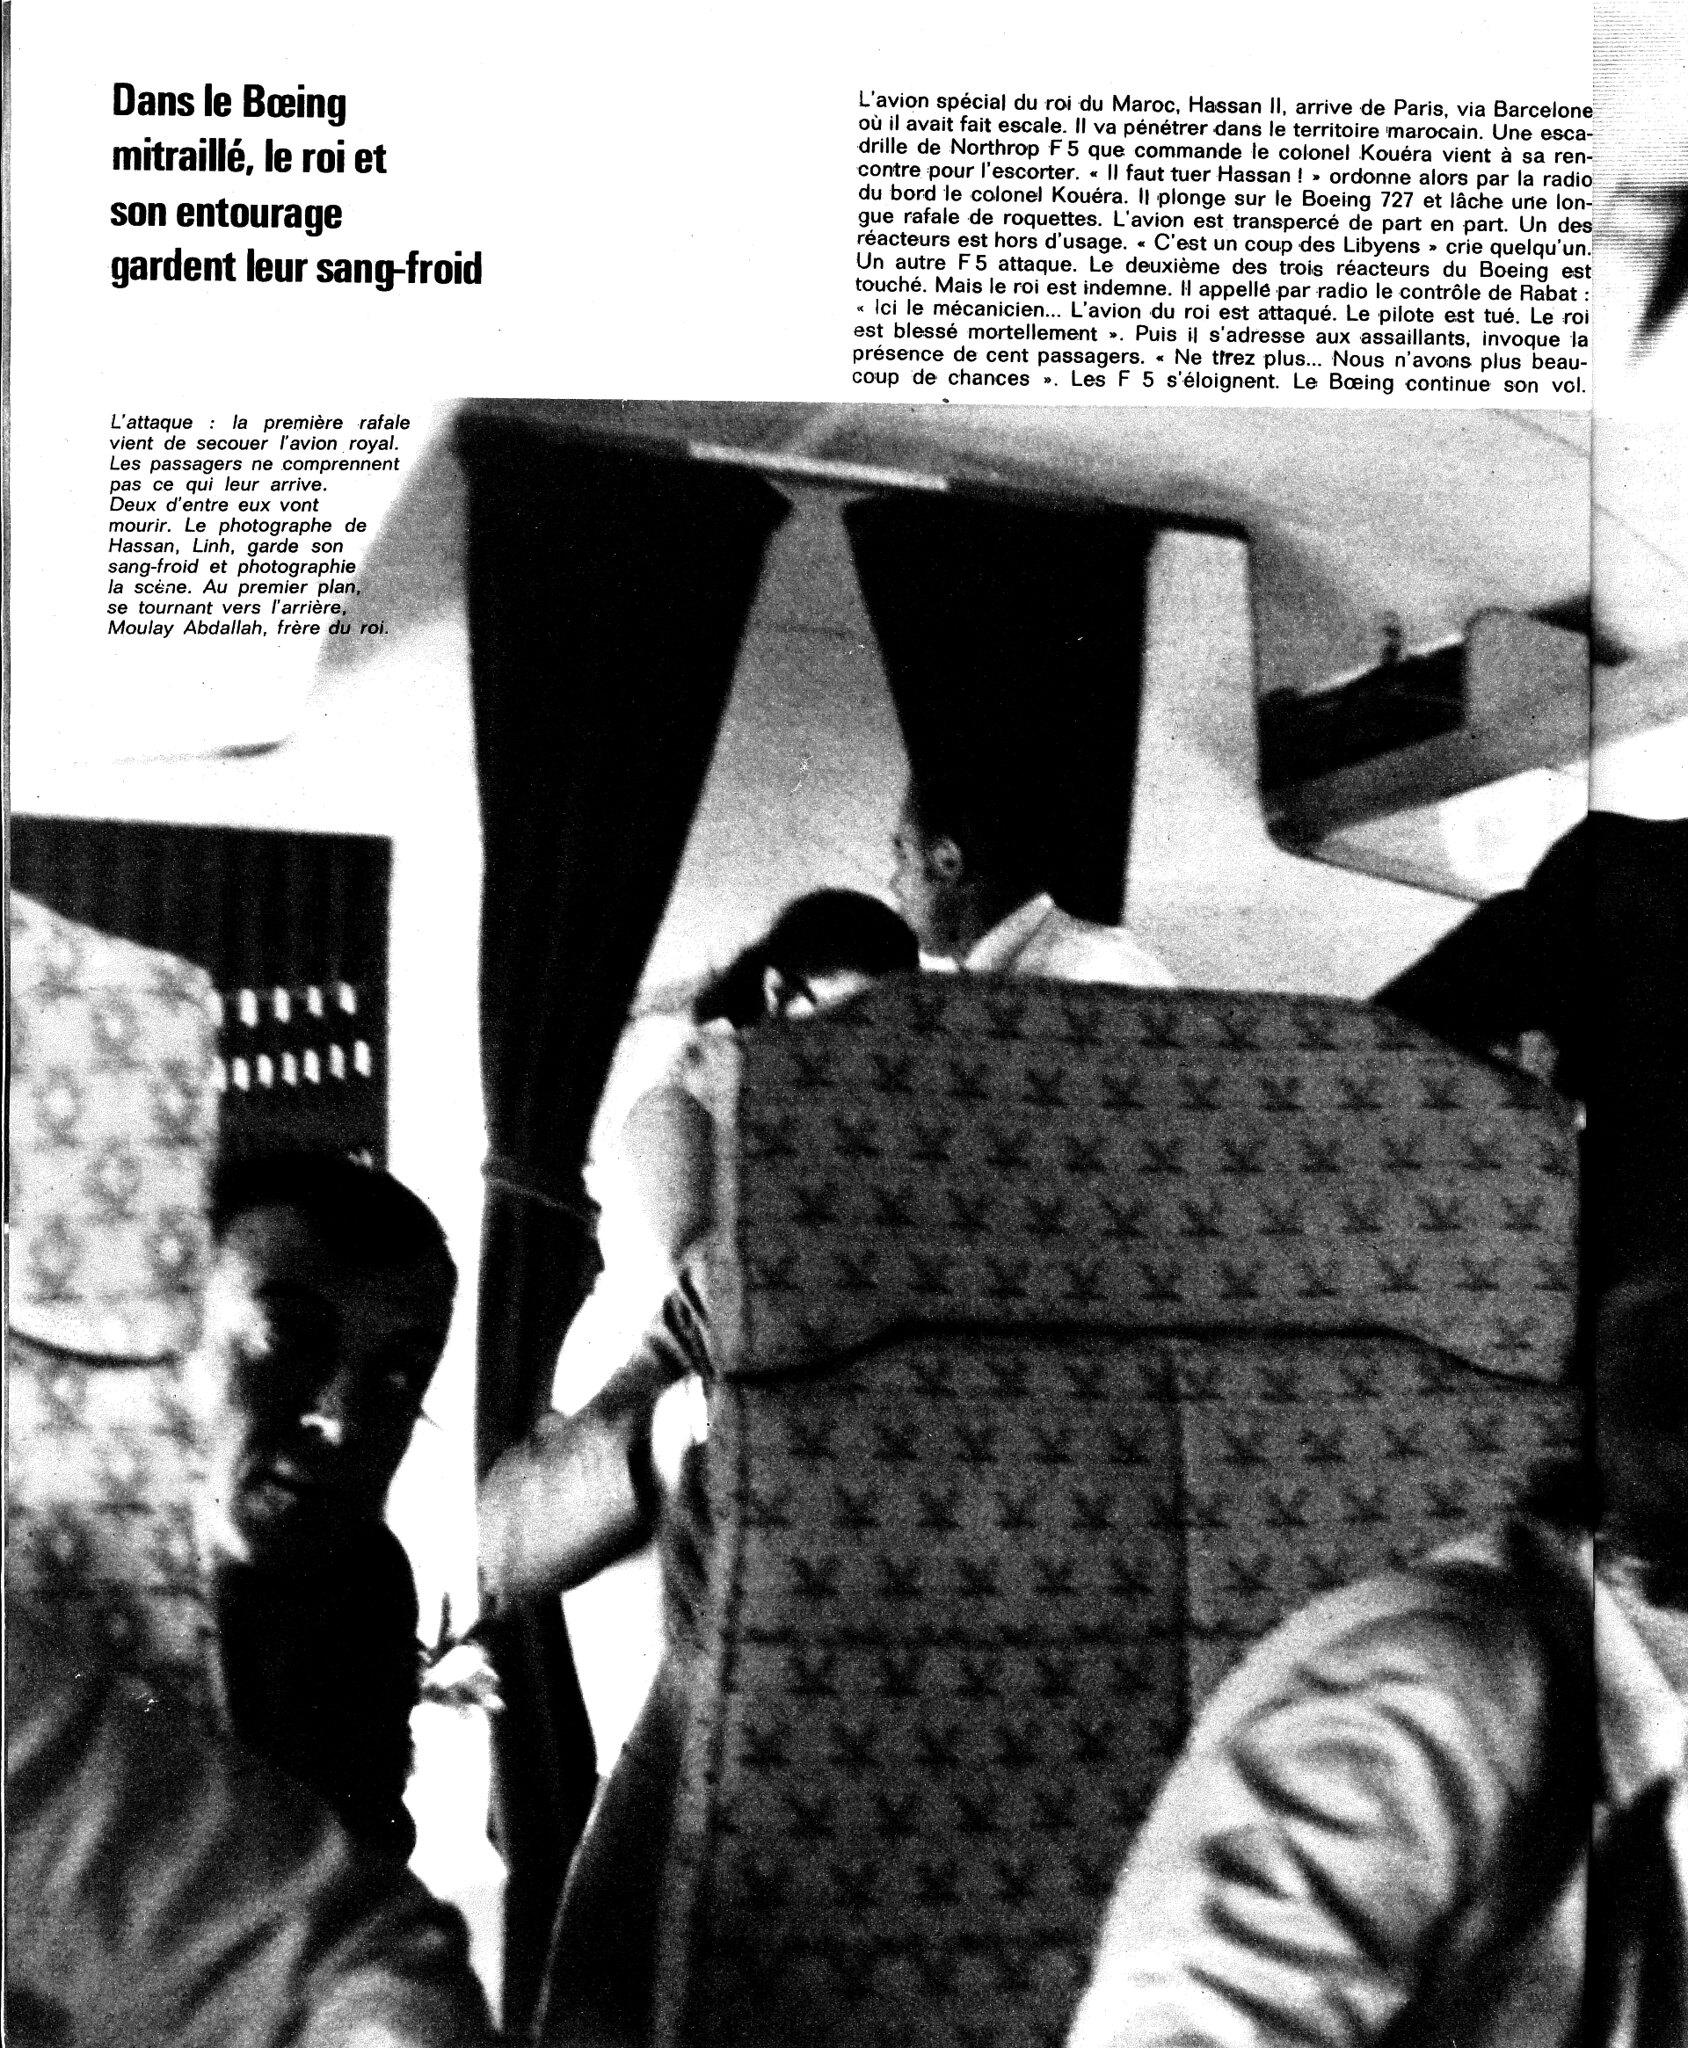 Tentative de coup d'État Boeing Royal vs F-5A/B Opération Borak le 16 août 1972 49015960481_aba57e92e4_k